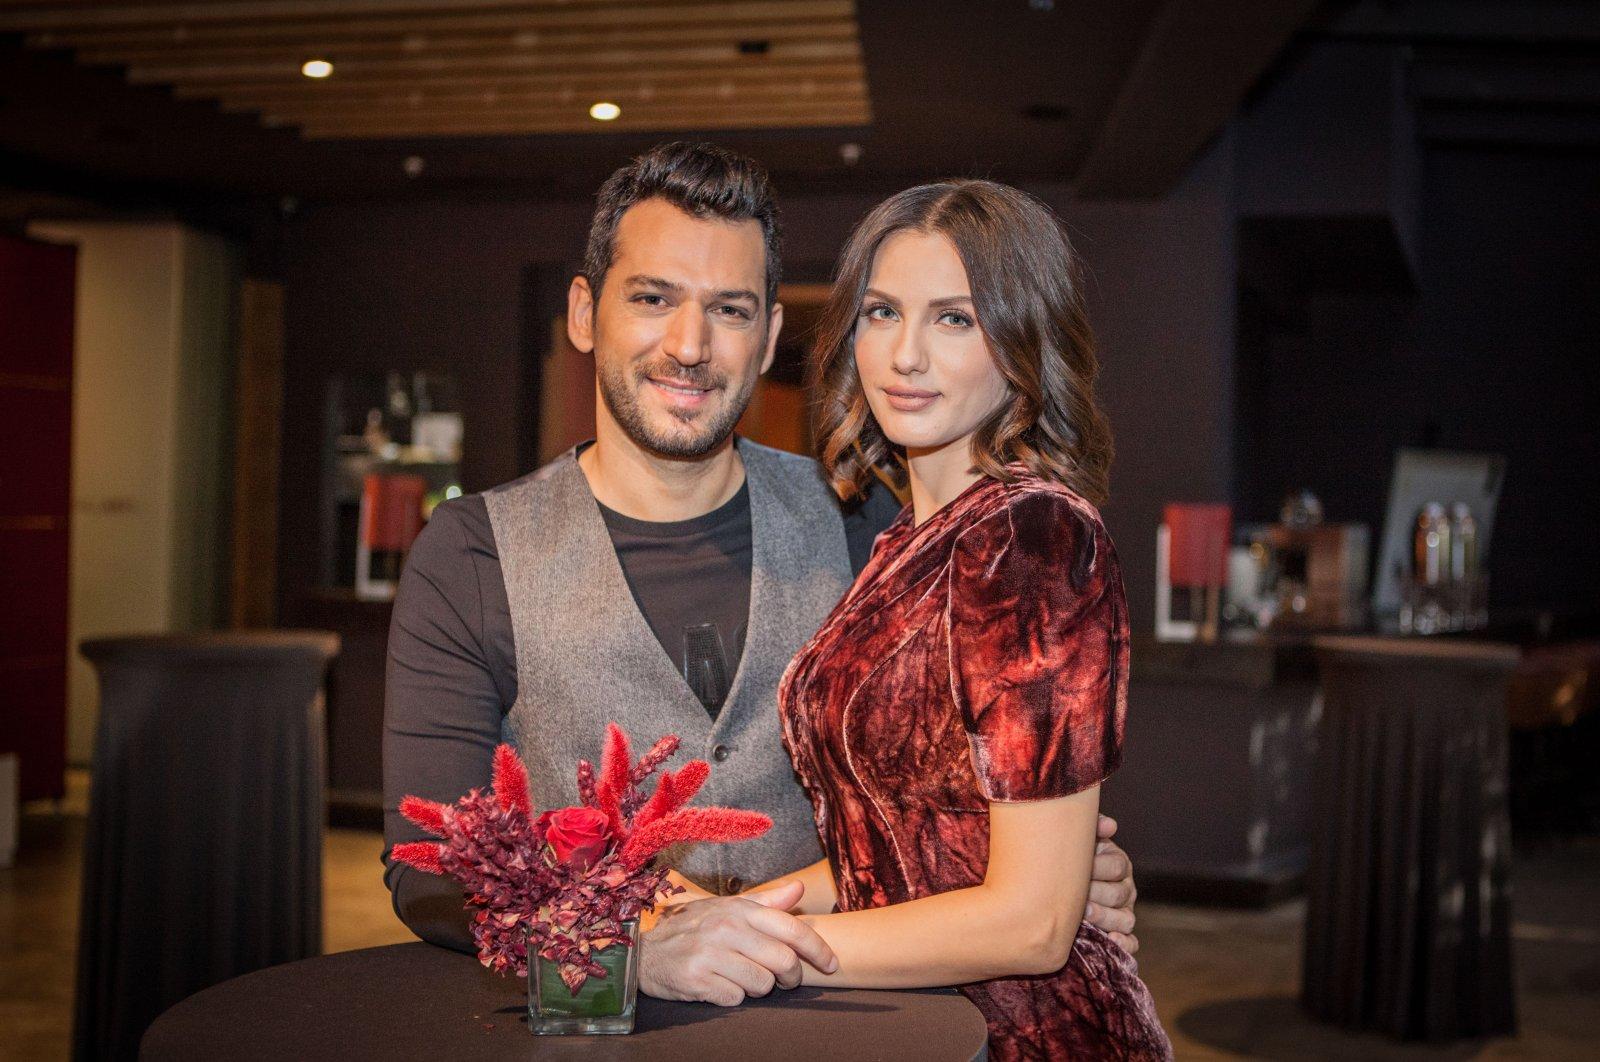 Turkish actor Murat Yıldırım and his wife Iman Elbani pose for a photo, 2018. (Photo by Hatice Çınar)